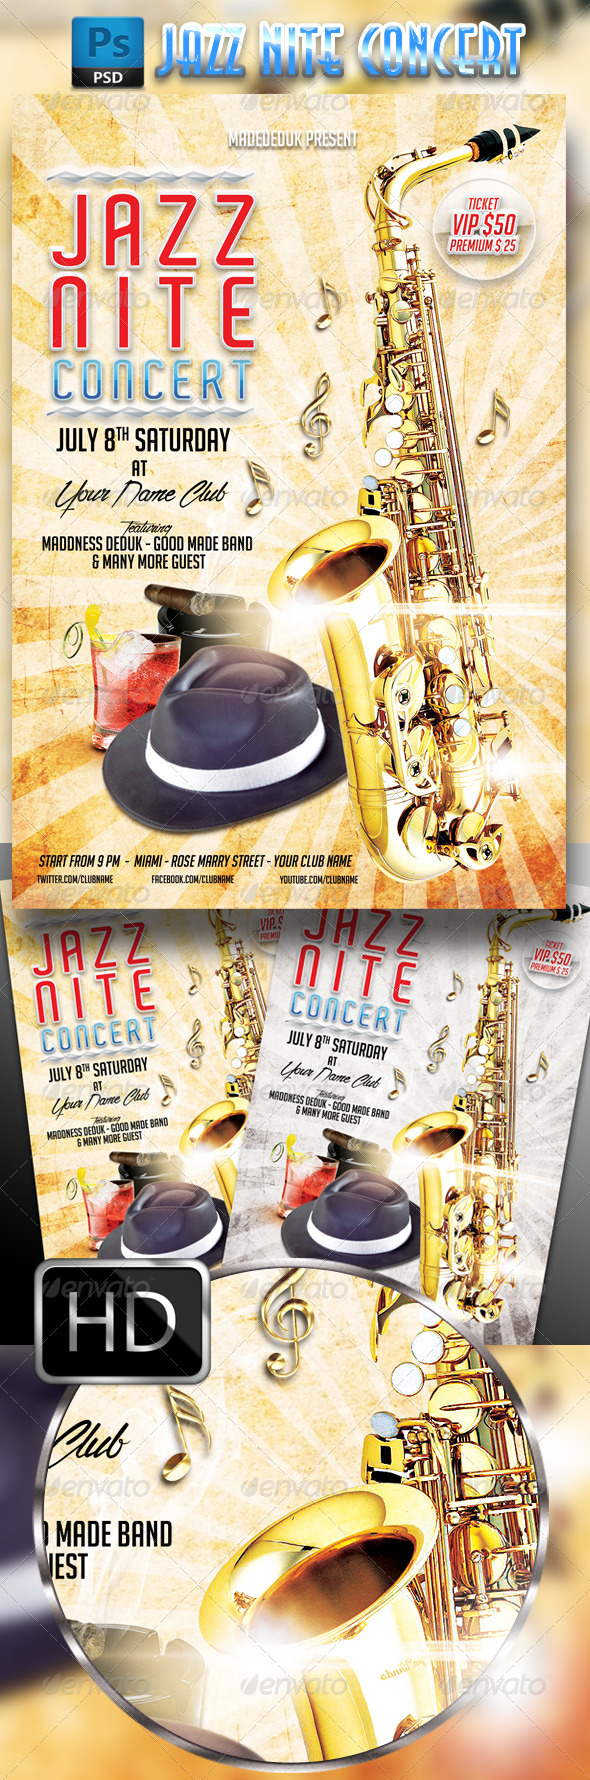 GraphicRiver Jazz Nite Concert Flyer 7995812